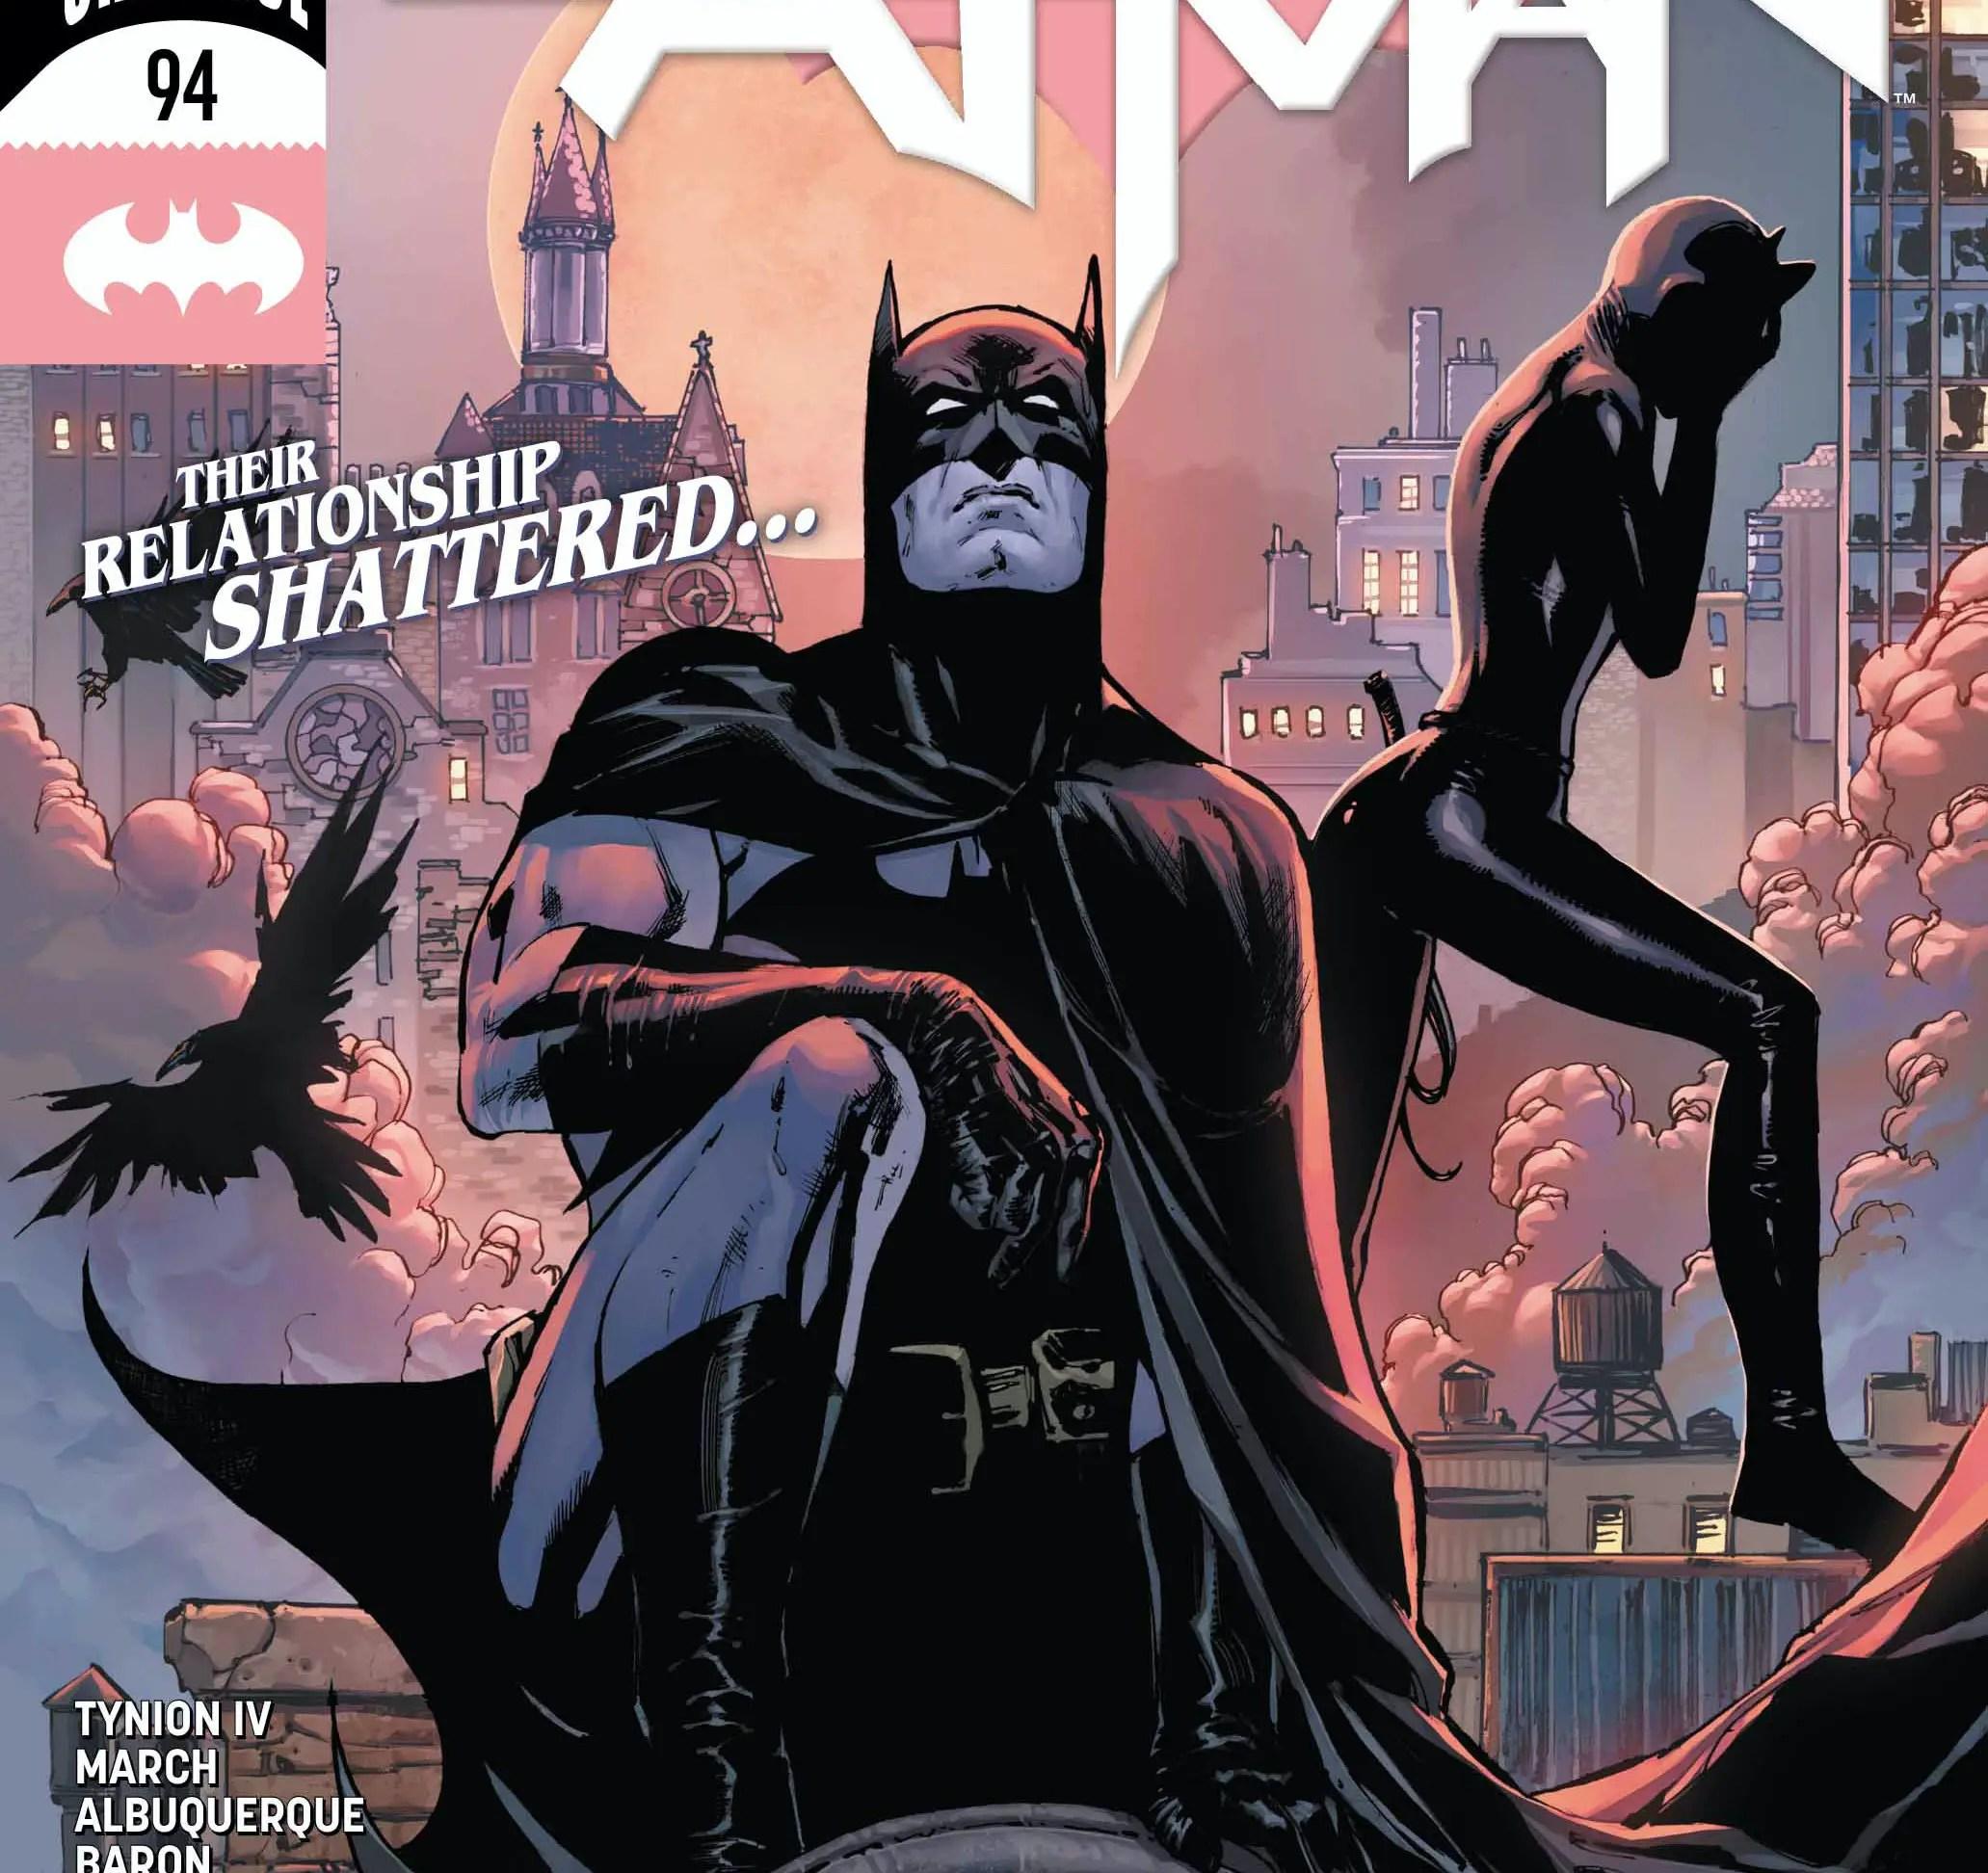 'Batman' #94 review: an interesting psychological reveal